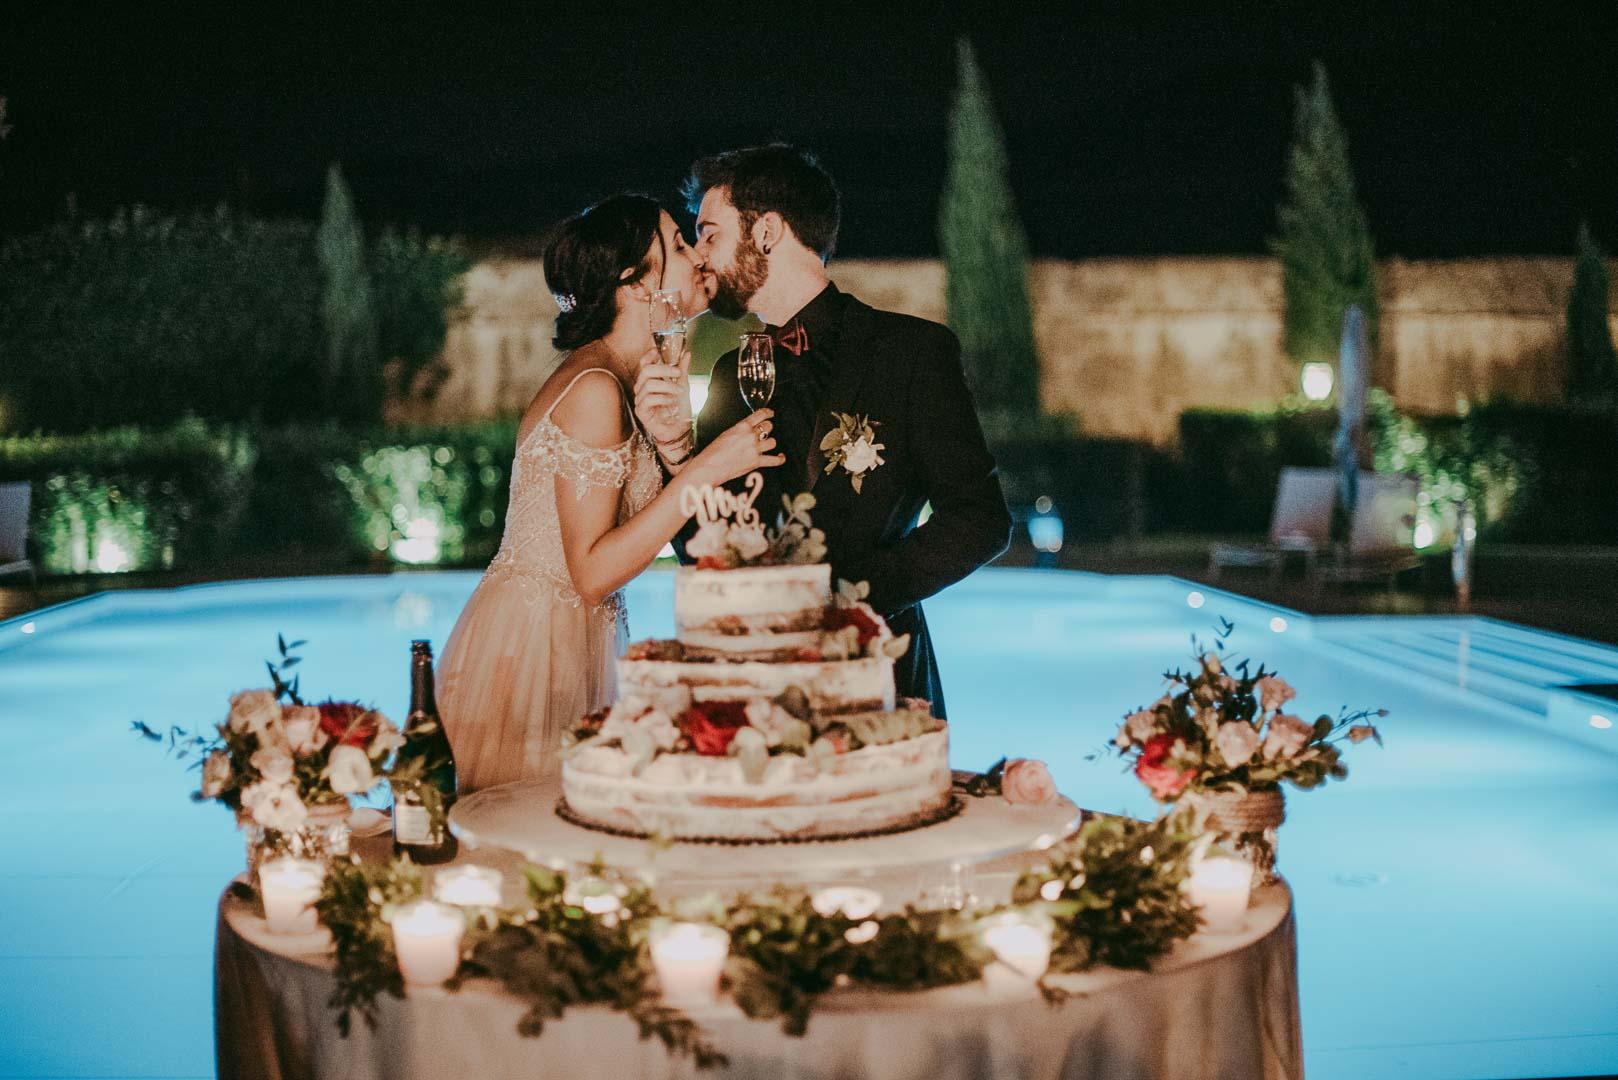 wedding-photographer-destination-fineart-bespoke-reportage-tuscany-villascorzi-vivianeizzo-spazio46-187